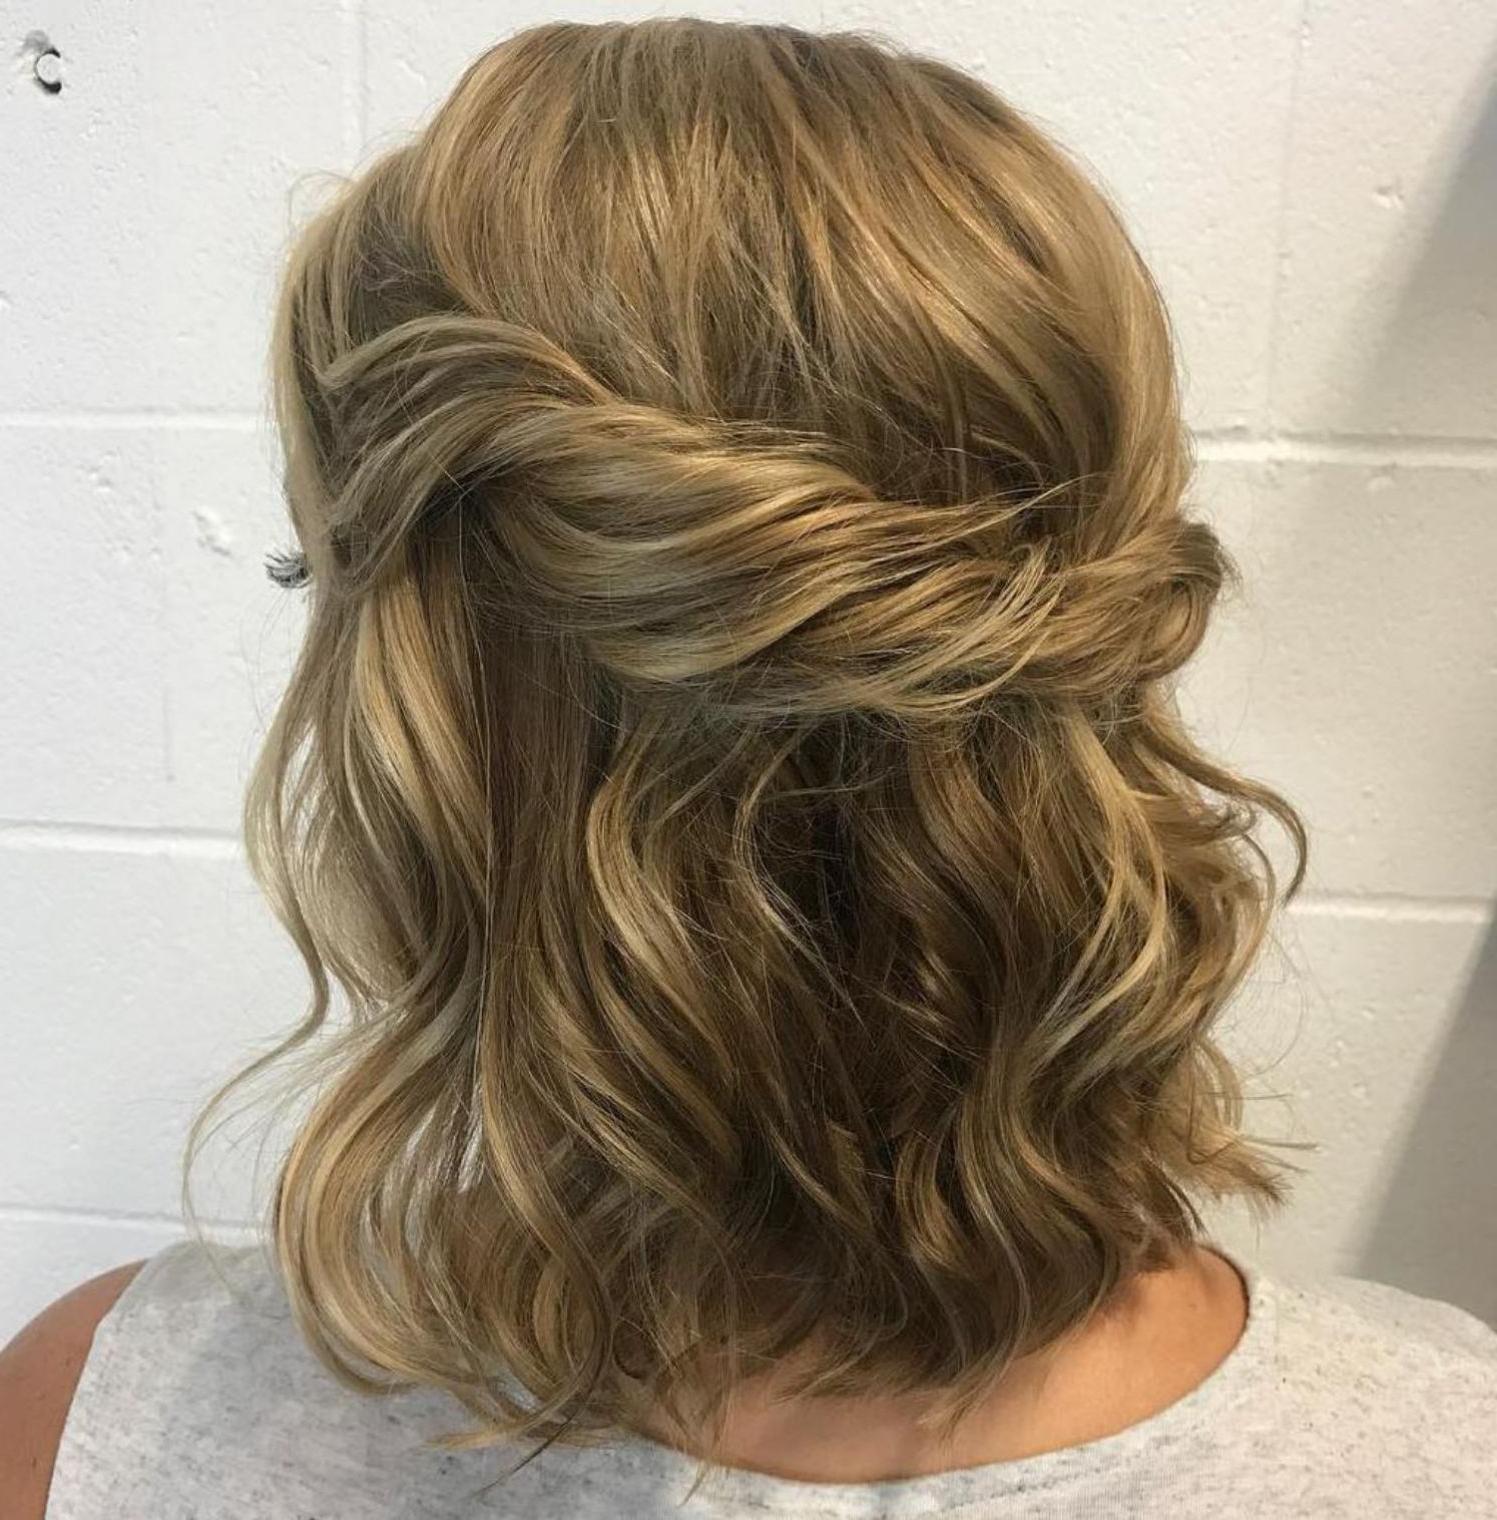 2019 Loose Highlighted Half Do Hairstyles Regarding 60 Trendiest Updos For Medium Length Hair (View 16 of 20)